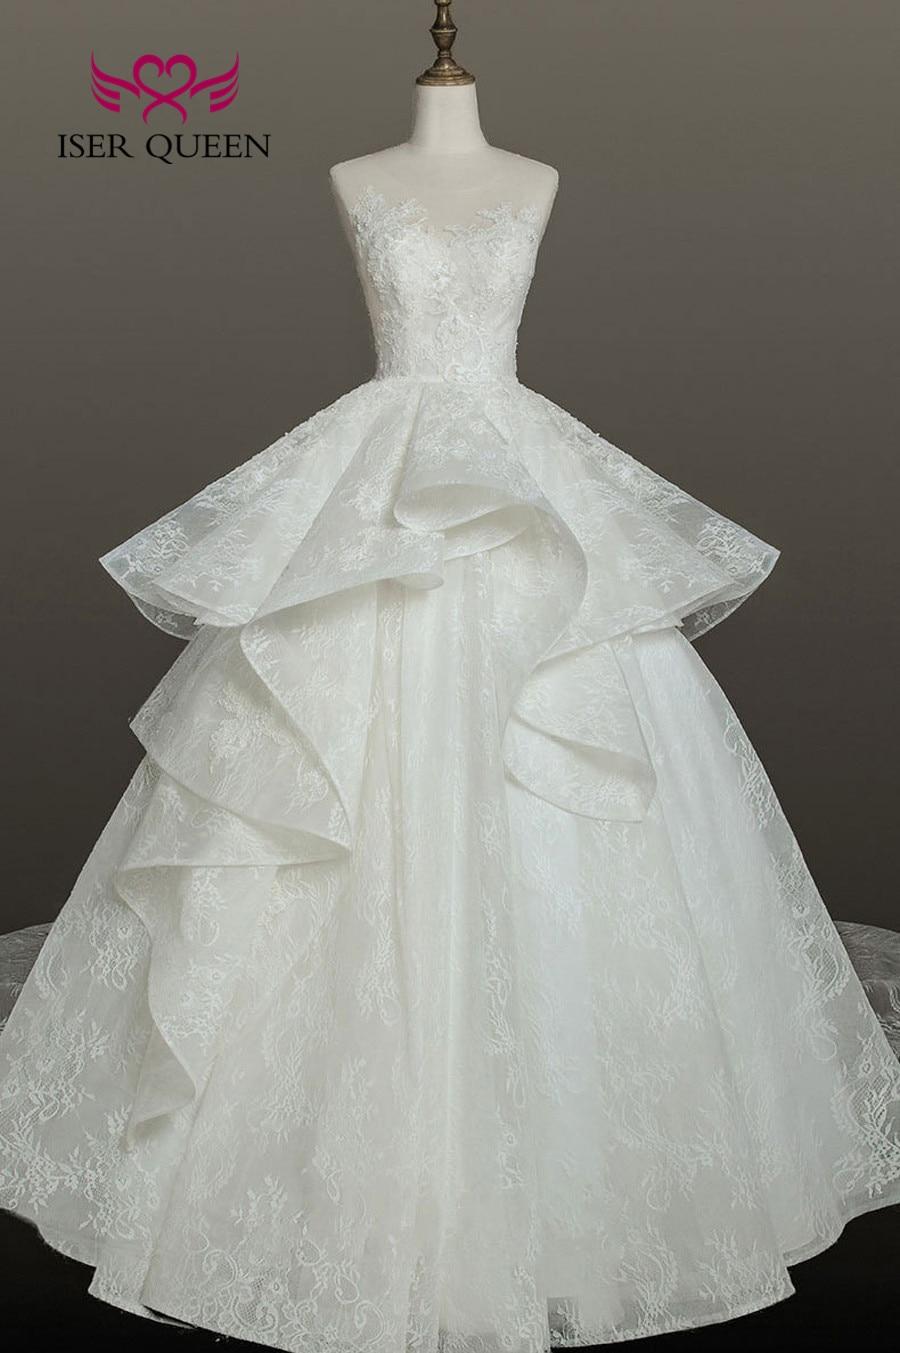 New Arrival Beautiful Ball Gown Lace Wedding Dress Organza Dubai Wedding Gown Bride Dress Vestido De Noiva WX0159